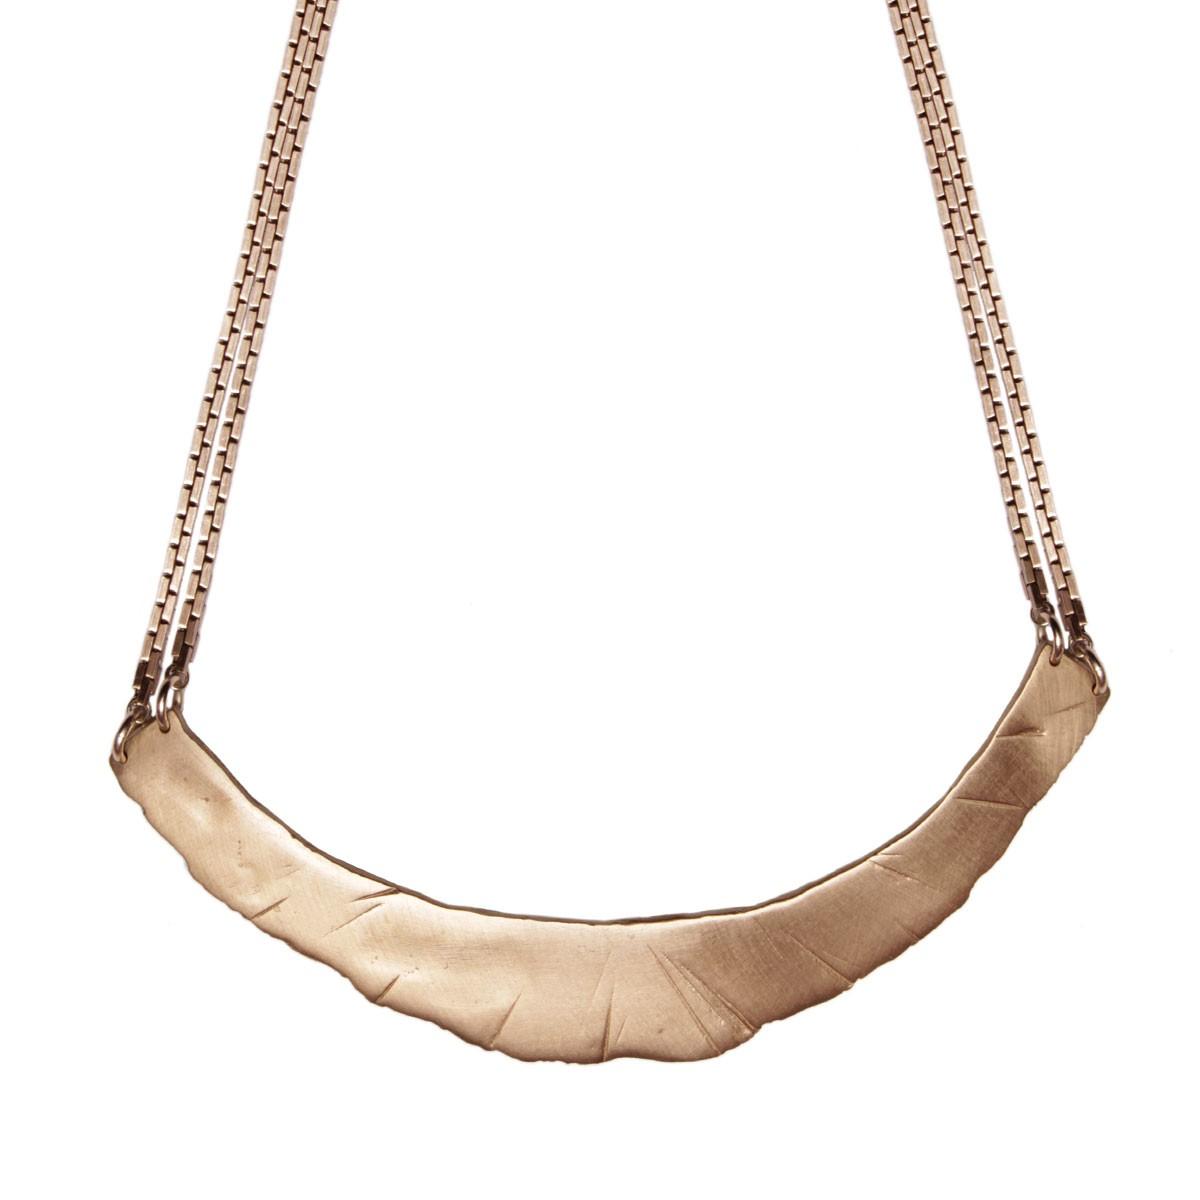 TK bronzeboldpalisadenecklace  - madeofjewelry